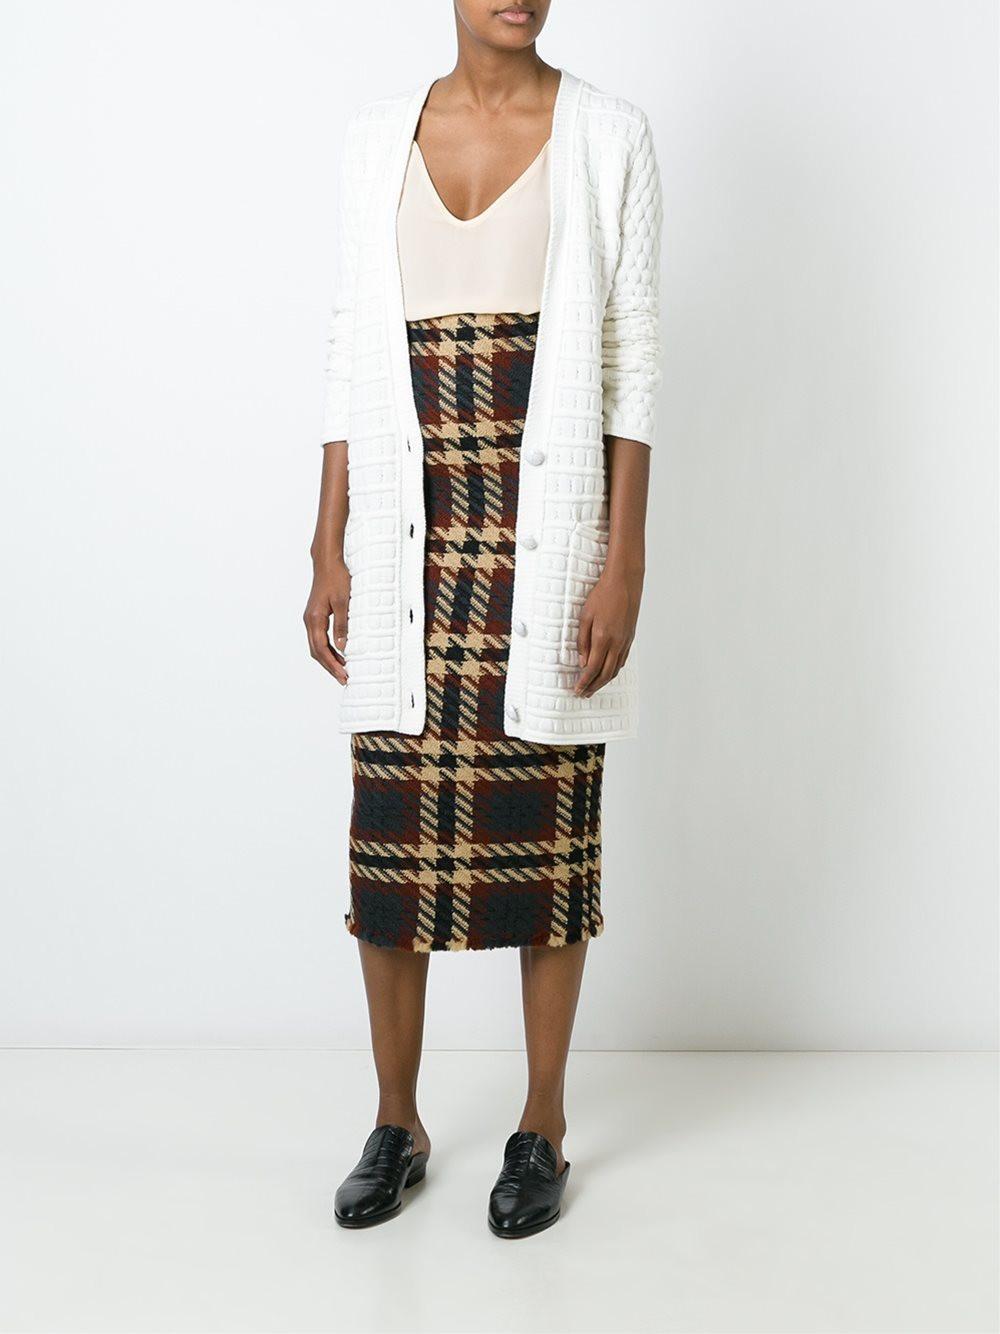 Erika Cavallini Checked Skirt $520.41